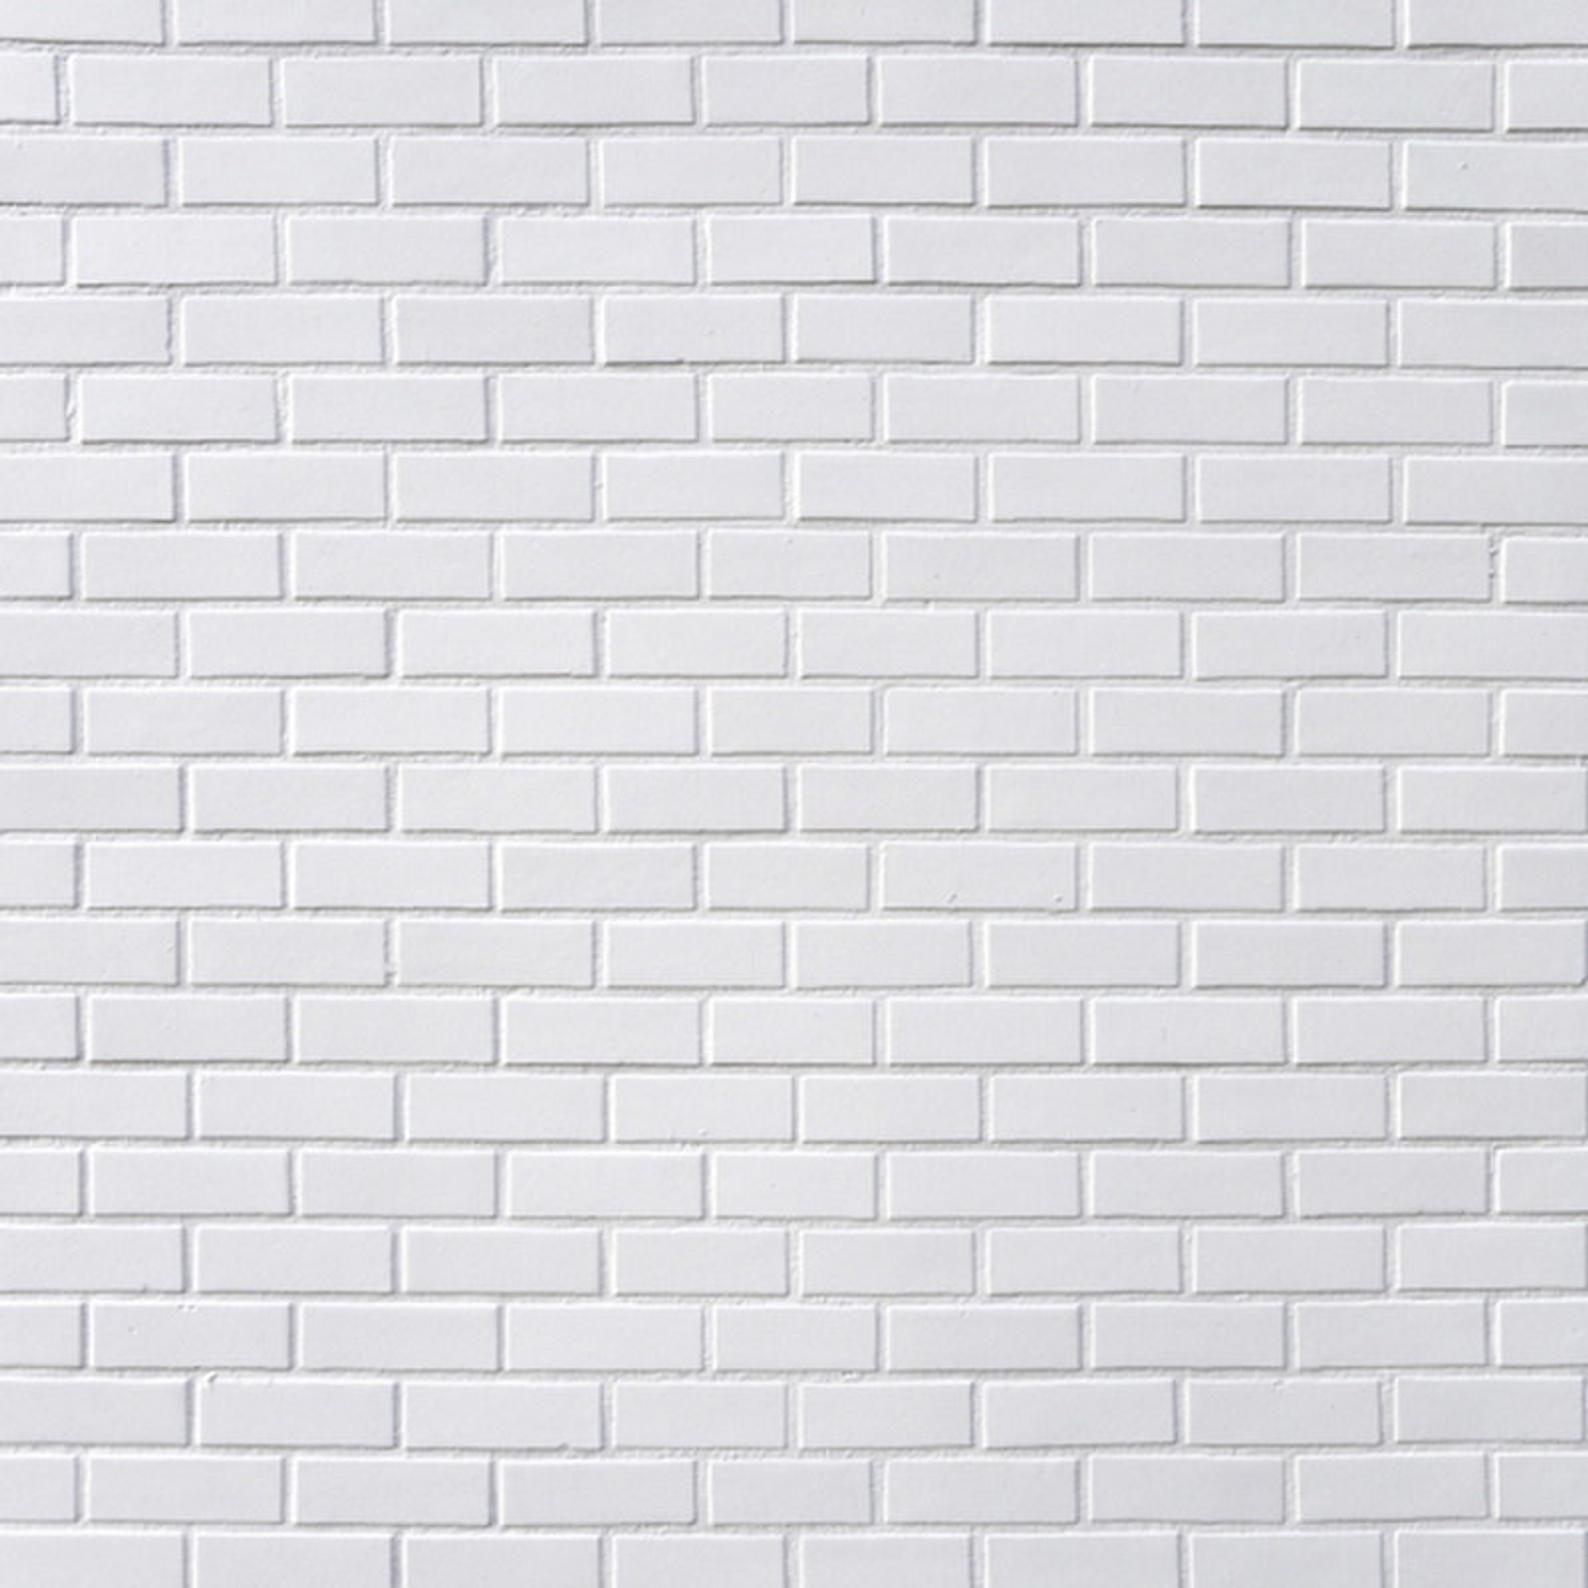 White Brick Wall Backdropnewborn Children Photography Etsy Brick Wall Backdrop White Brick White Brick Wallpaper